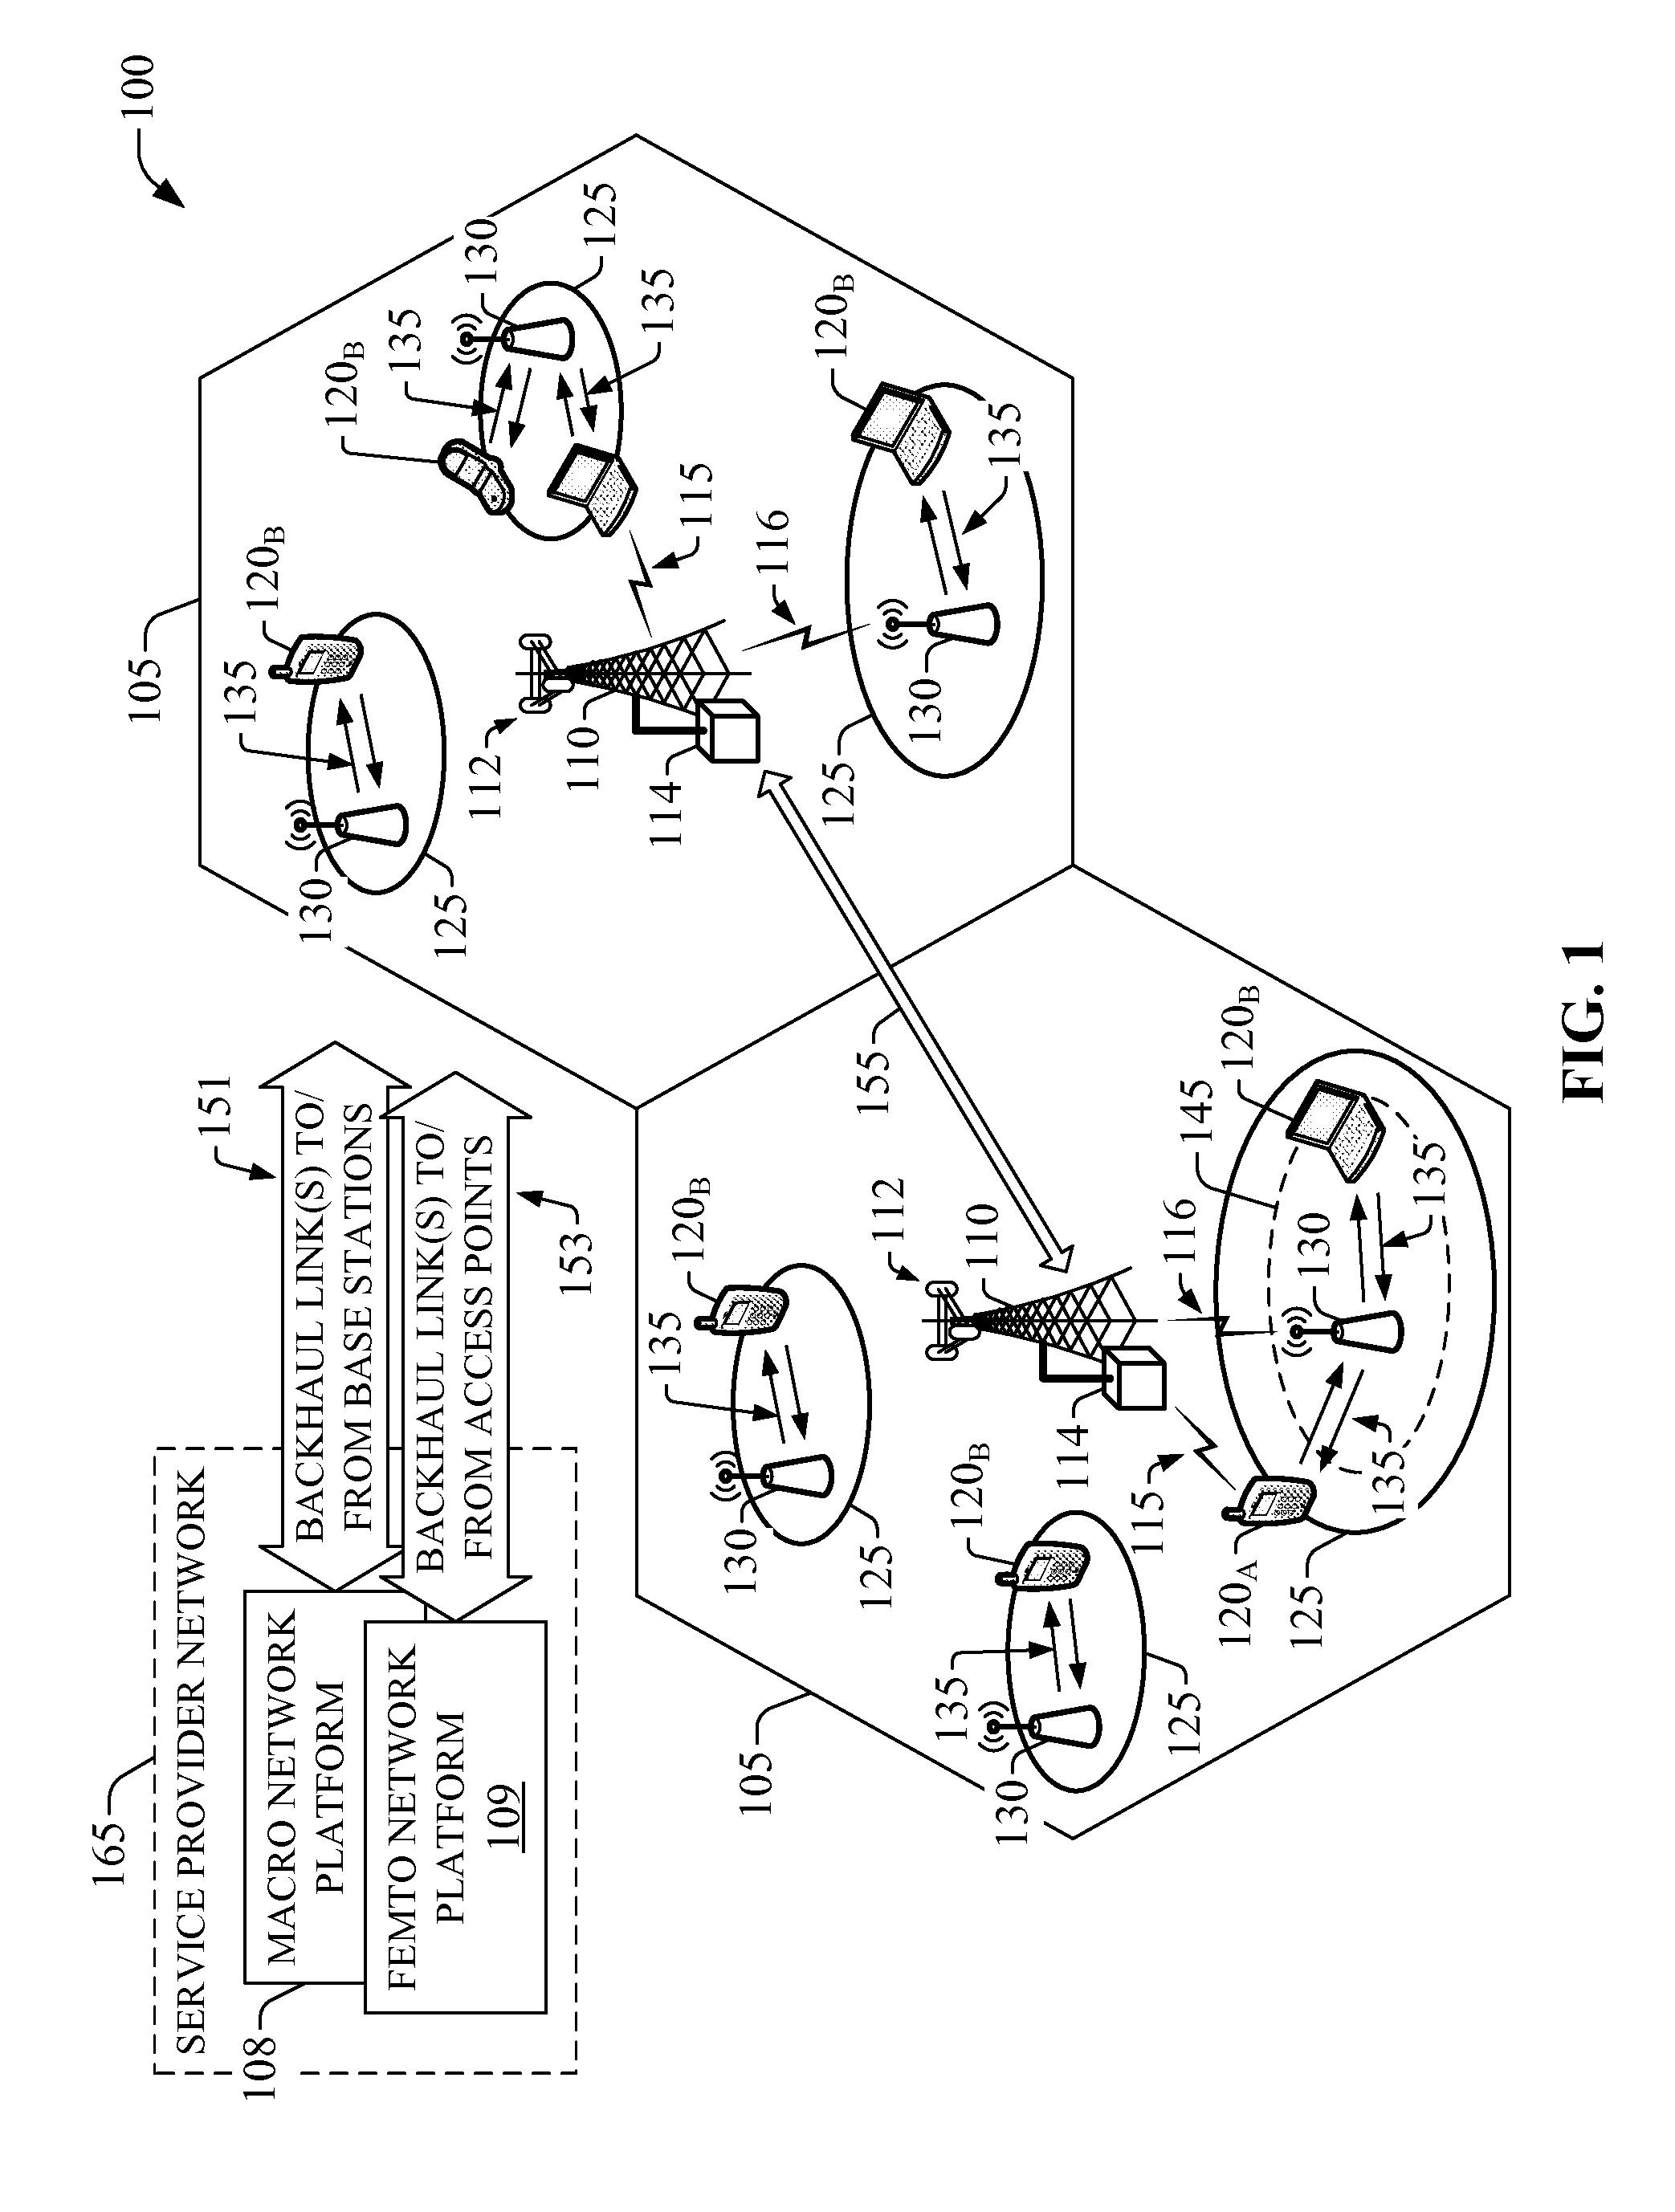 Amc amx fuse box 1991 alfa romeo spider wiring diagram at freeautoresponder co